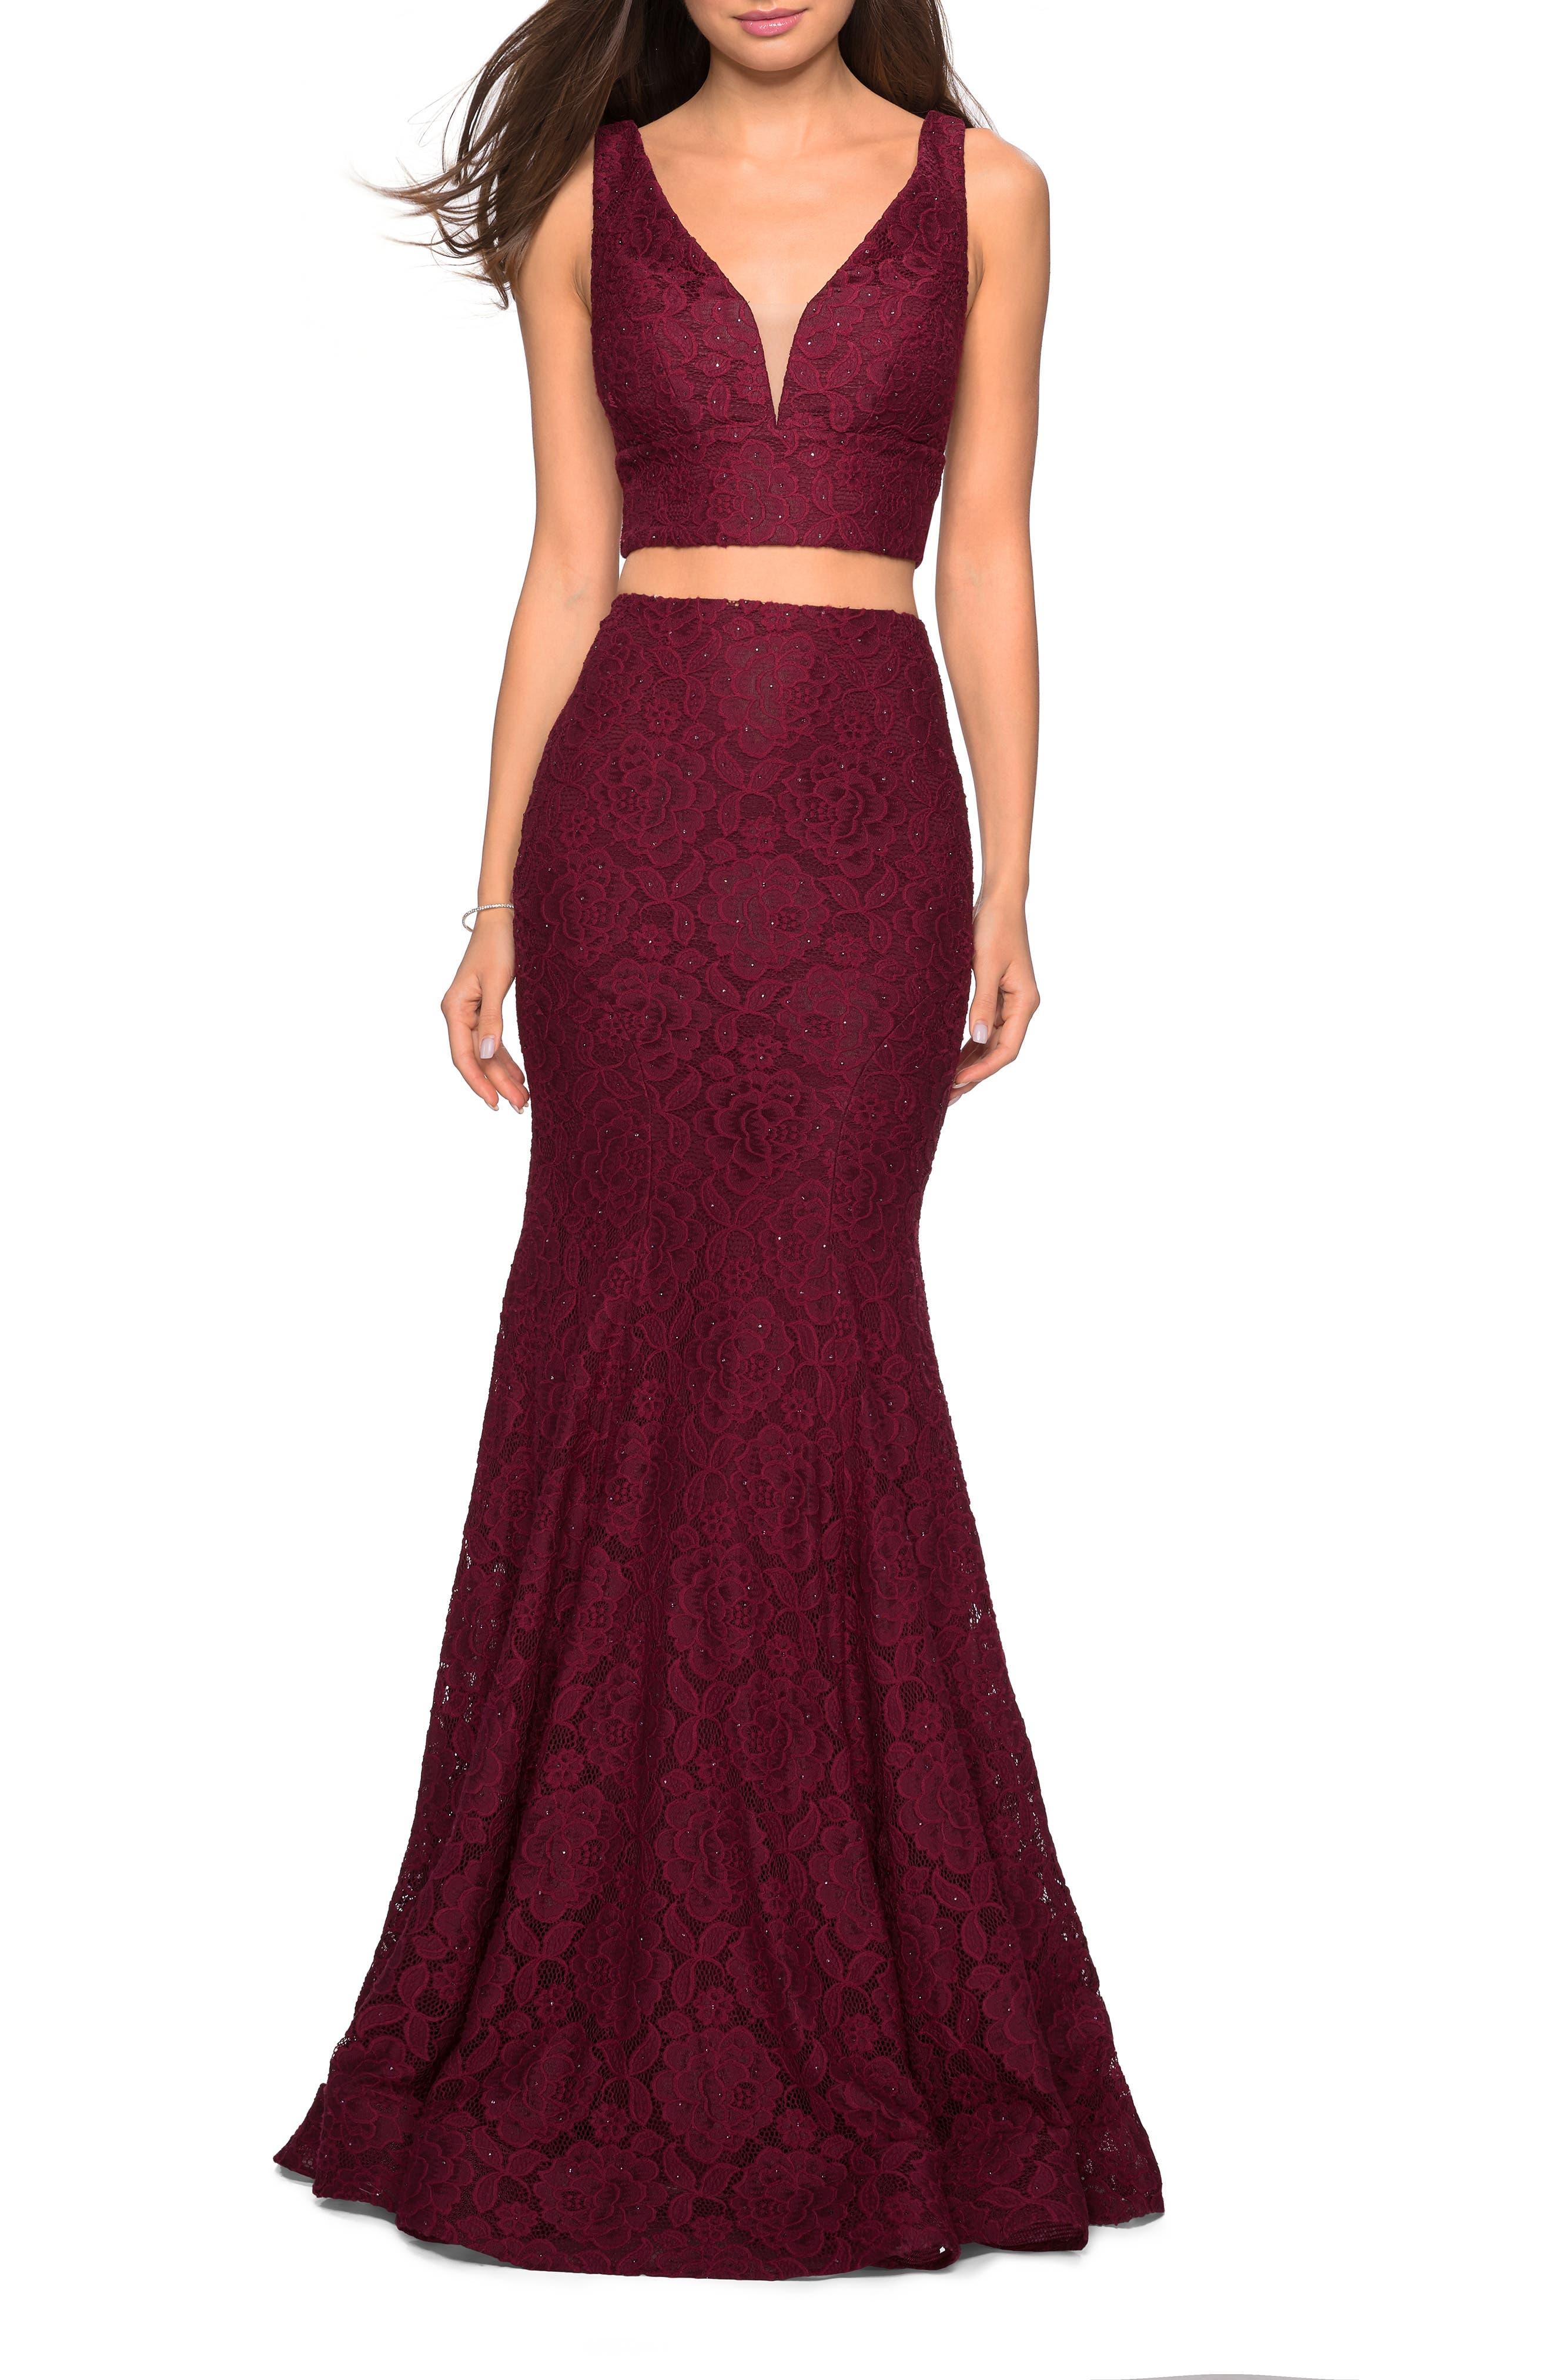 La Femme Two-Piece Stretch Lace Mermaid Evening Dress, Burgundy